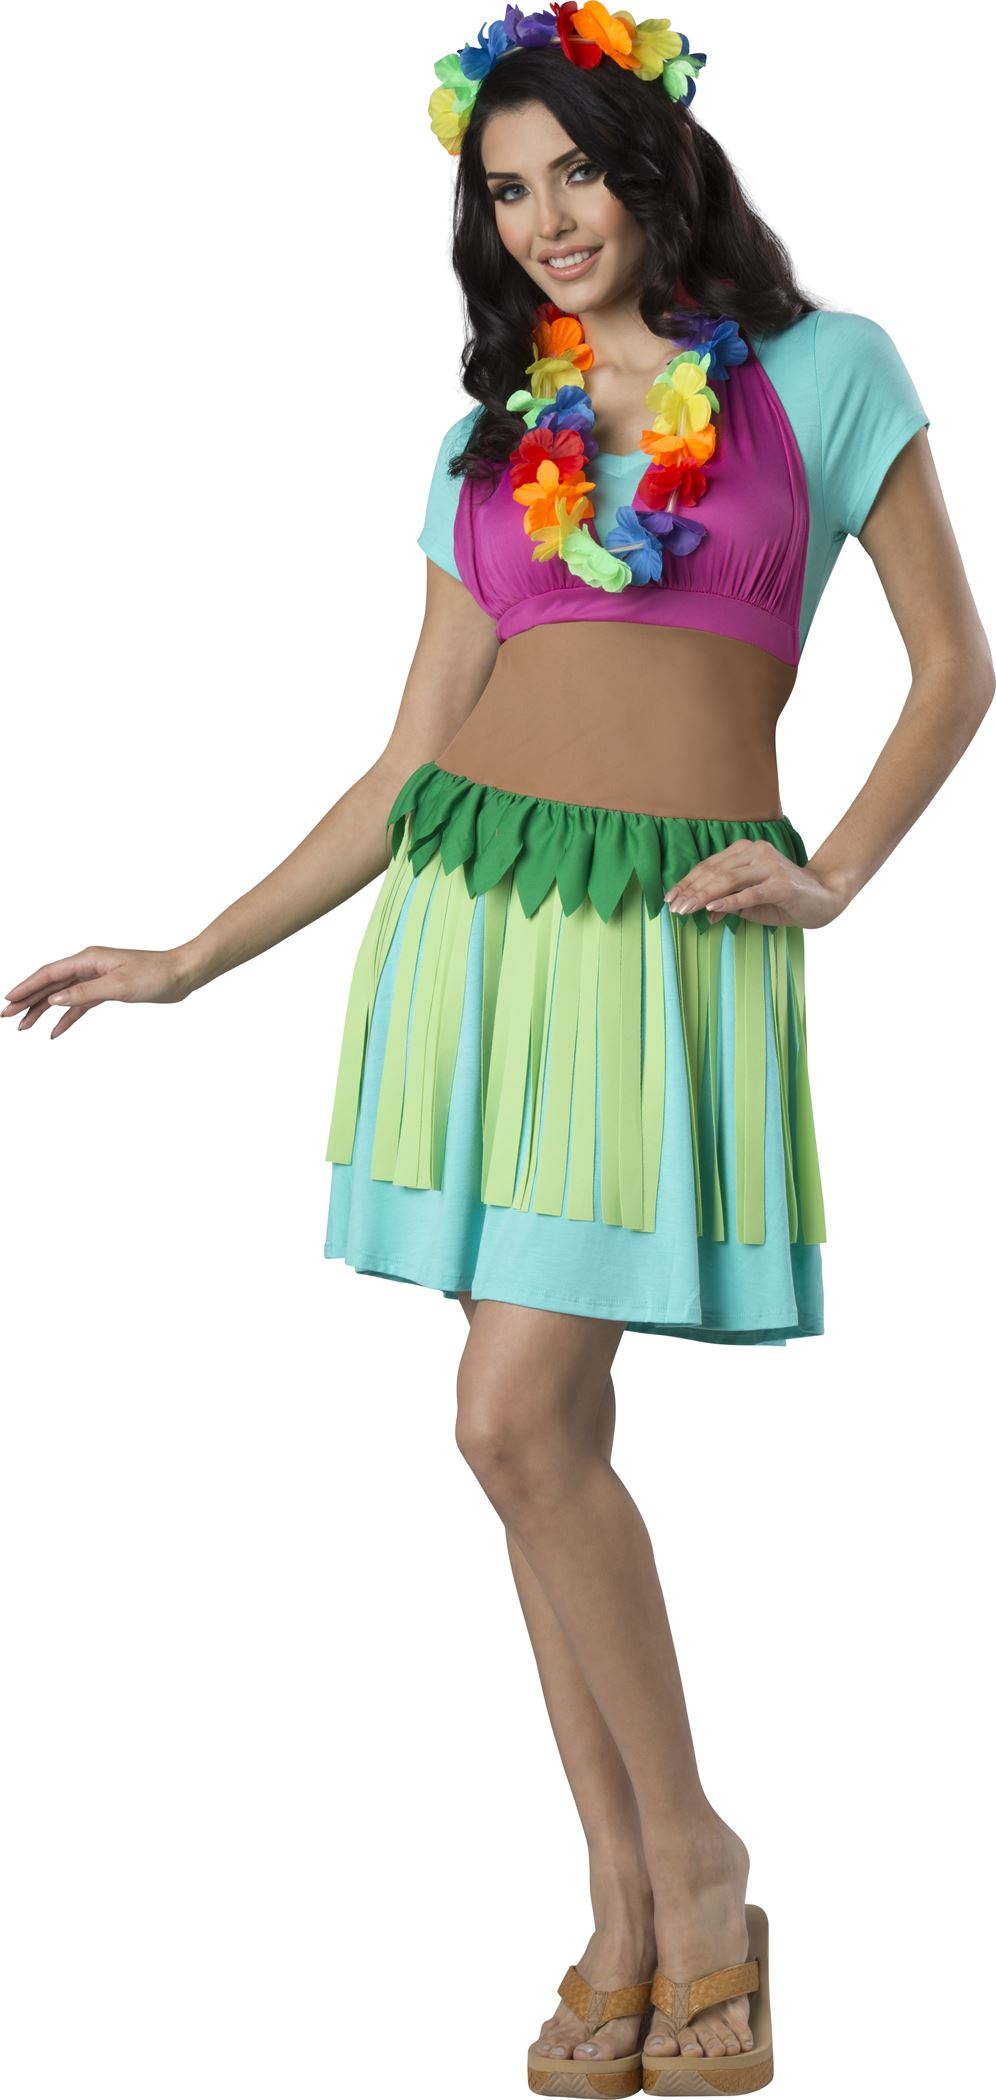 Adult Hawaiian Hula Apron Costume   $24.99   The Costume Land